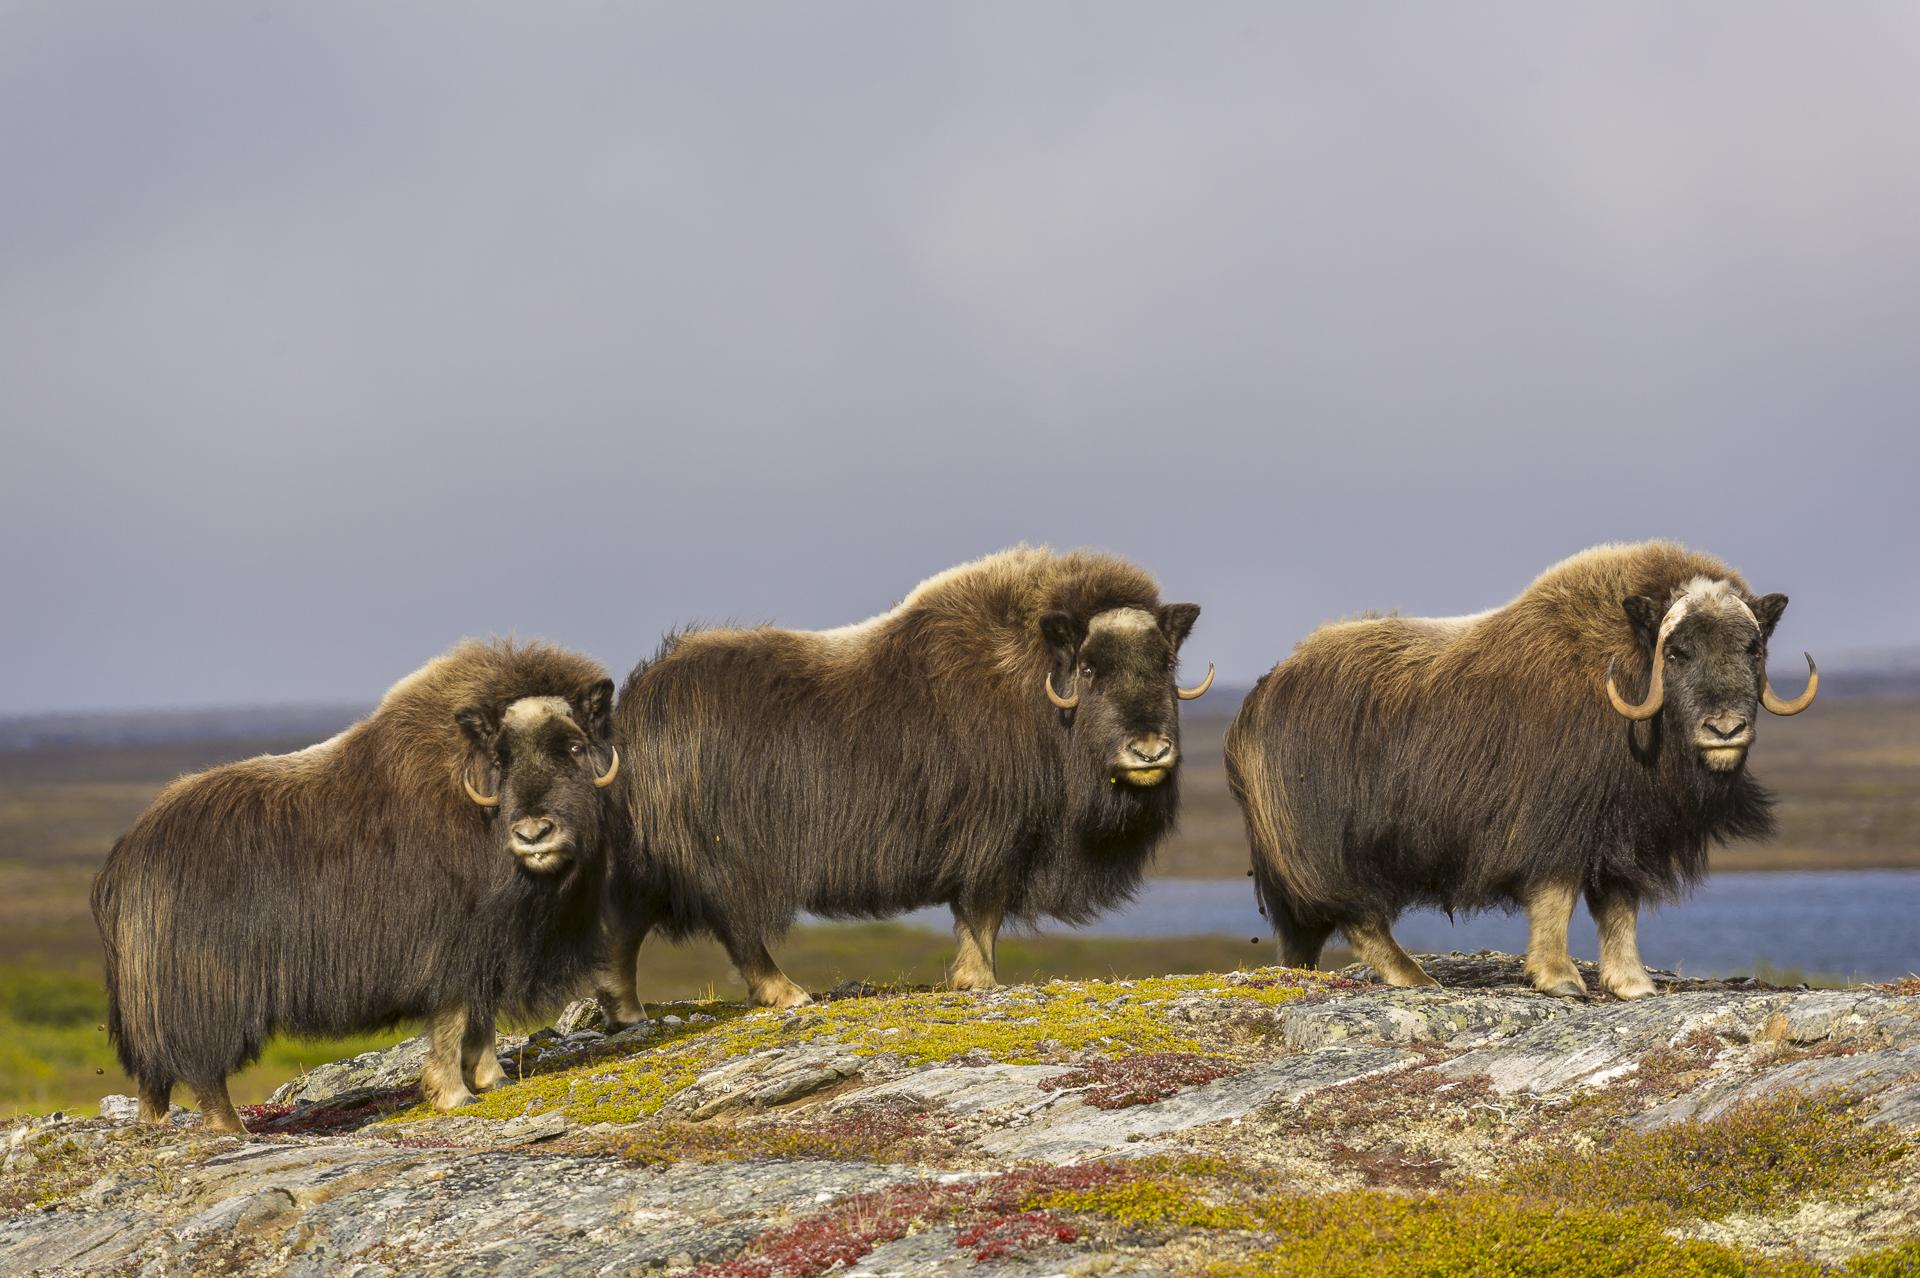 Muskoxen cresting a ridge